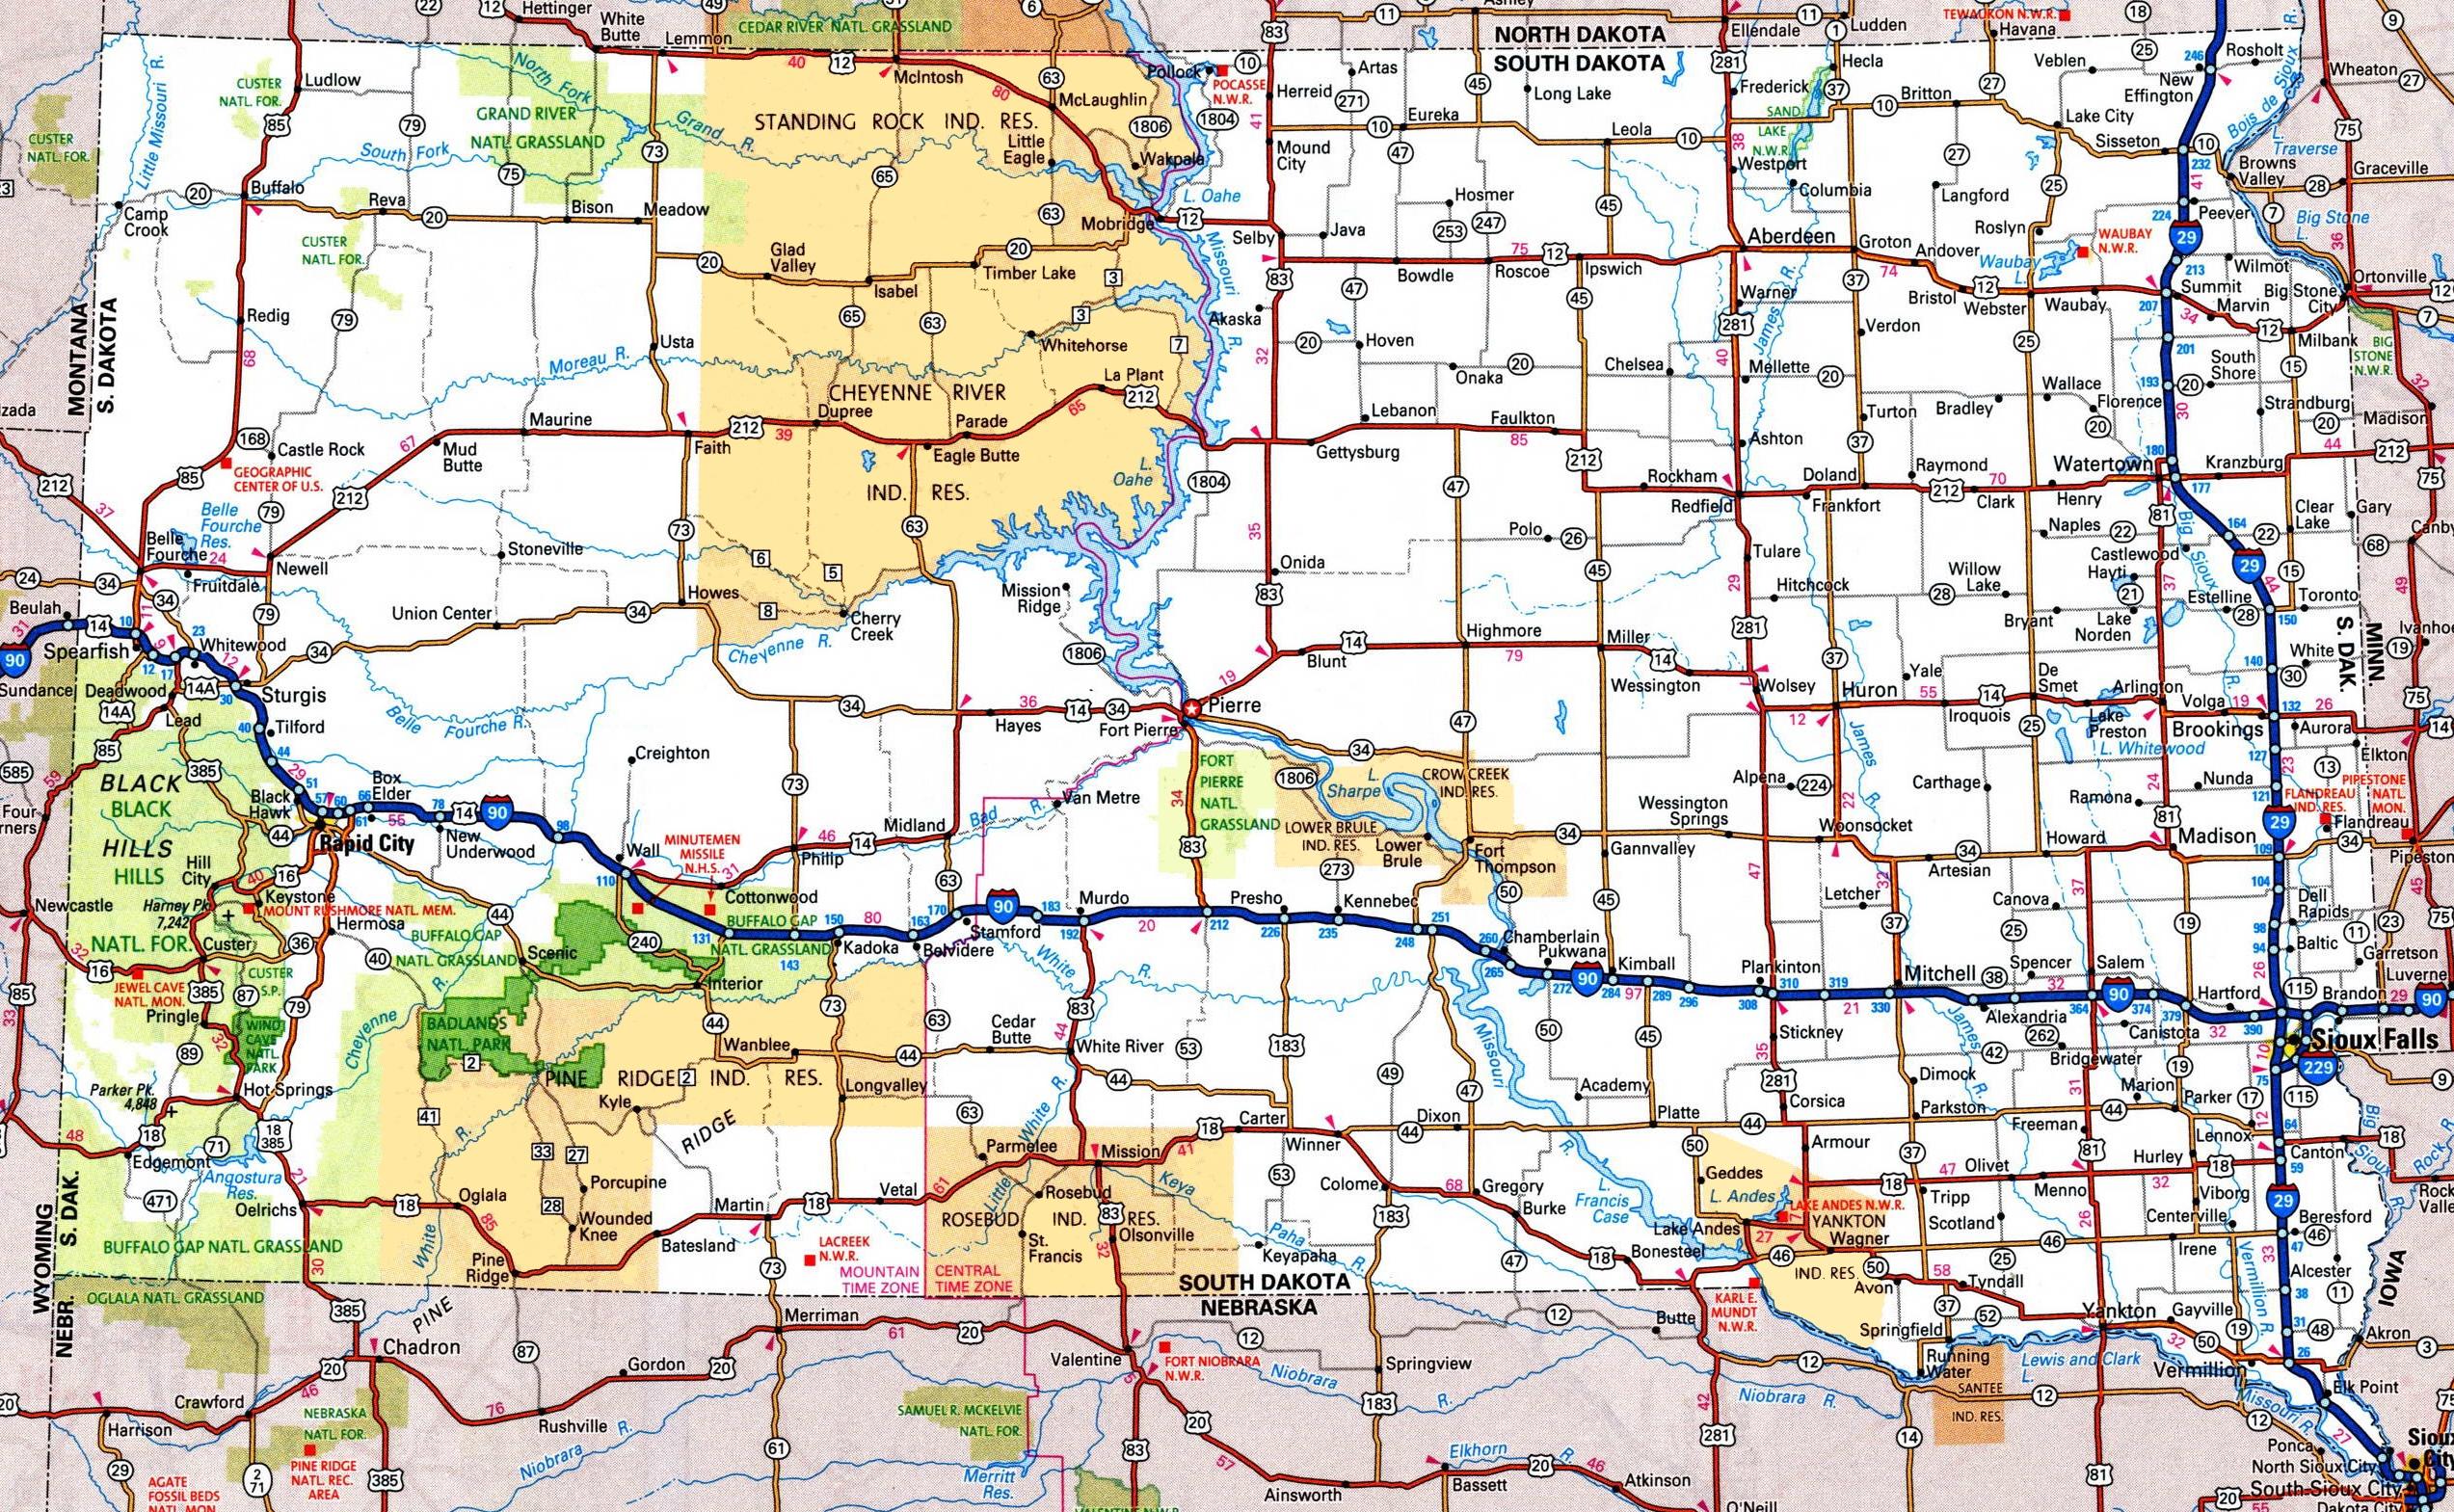 Map Of South Dakota South Dakota road map Map Of South Dakota